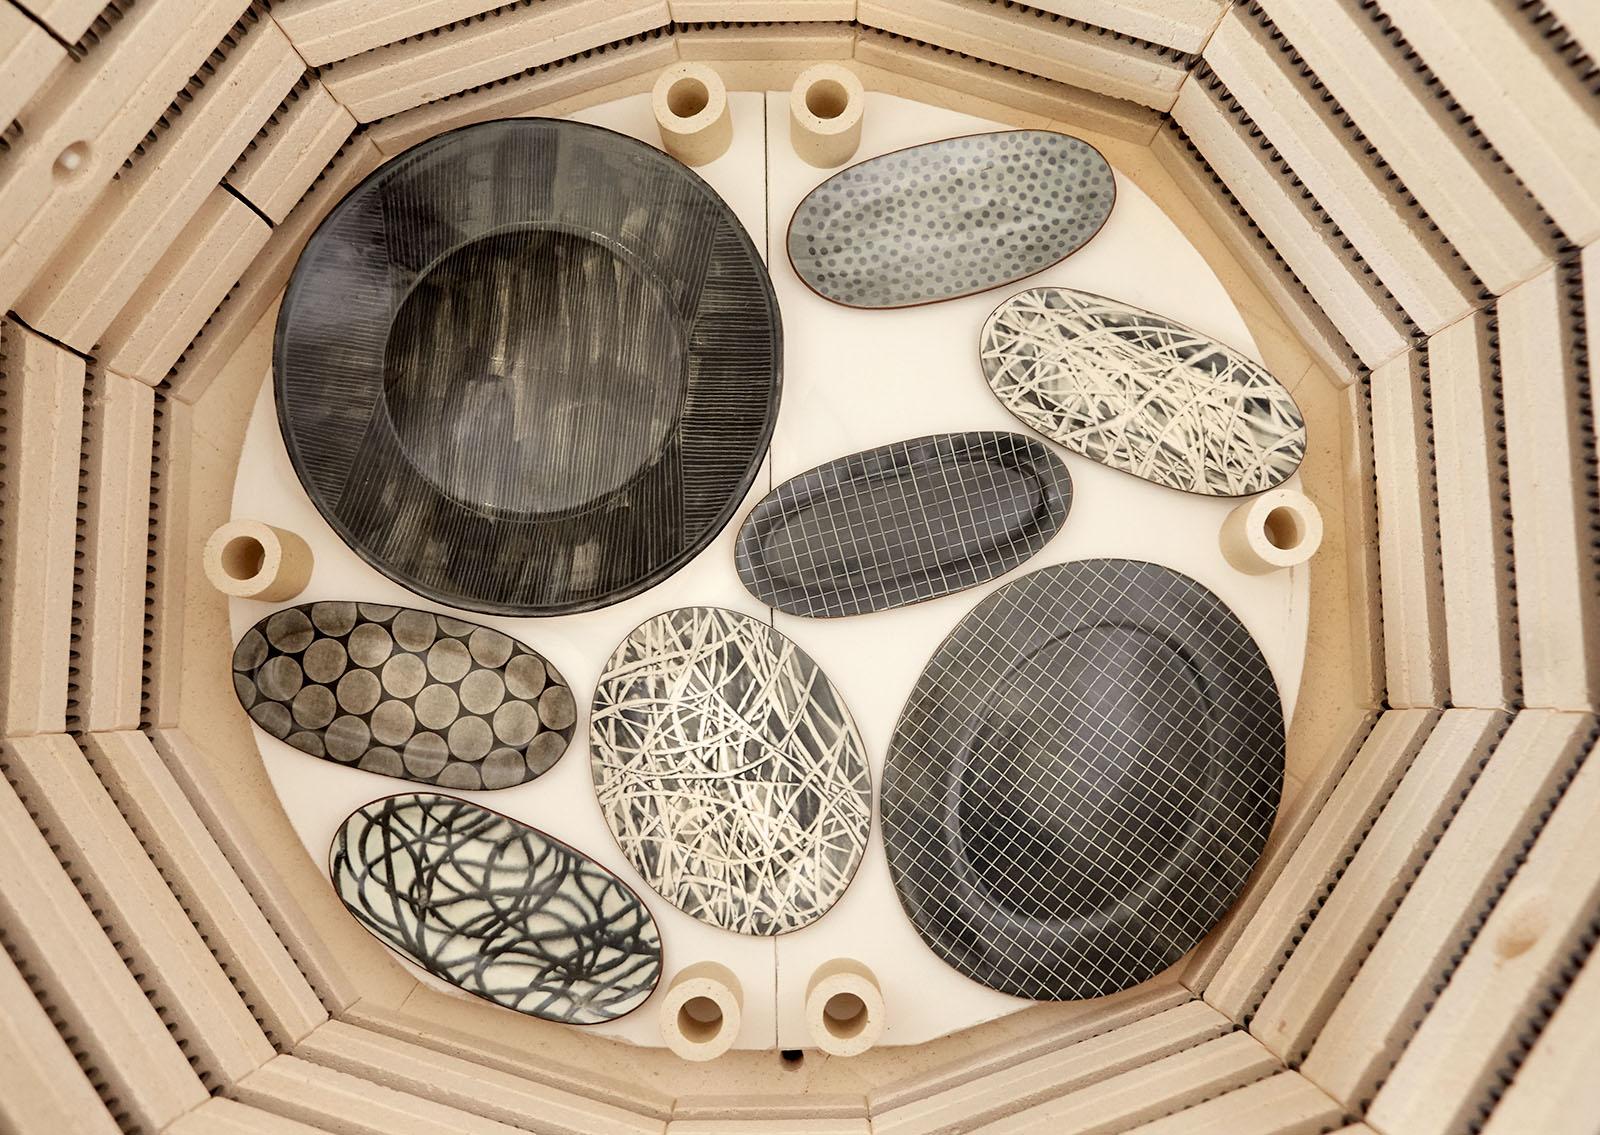 Brennofen / Keramik Atelier Corinna Petra Friedrich